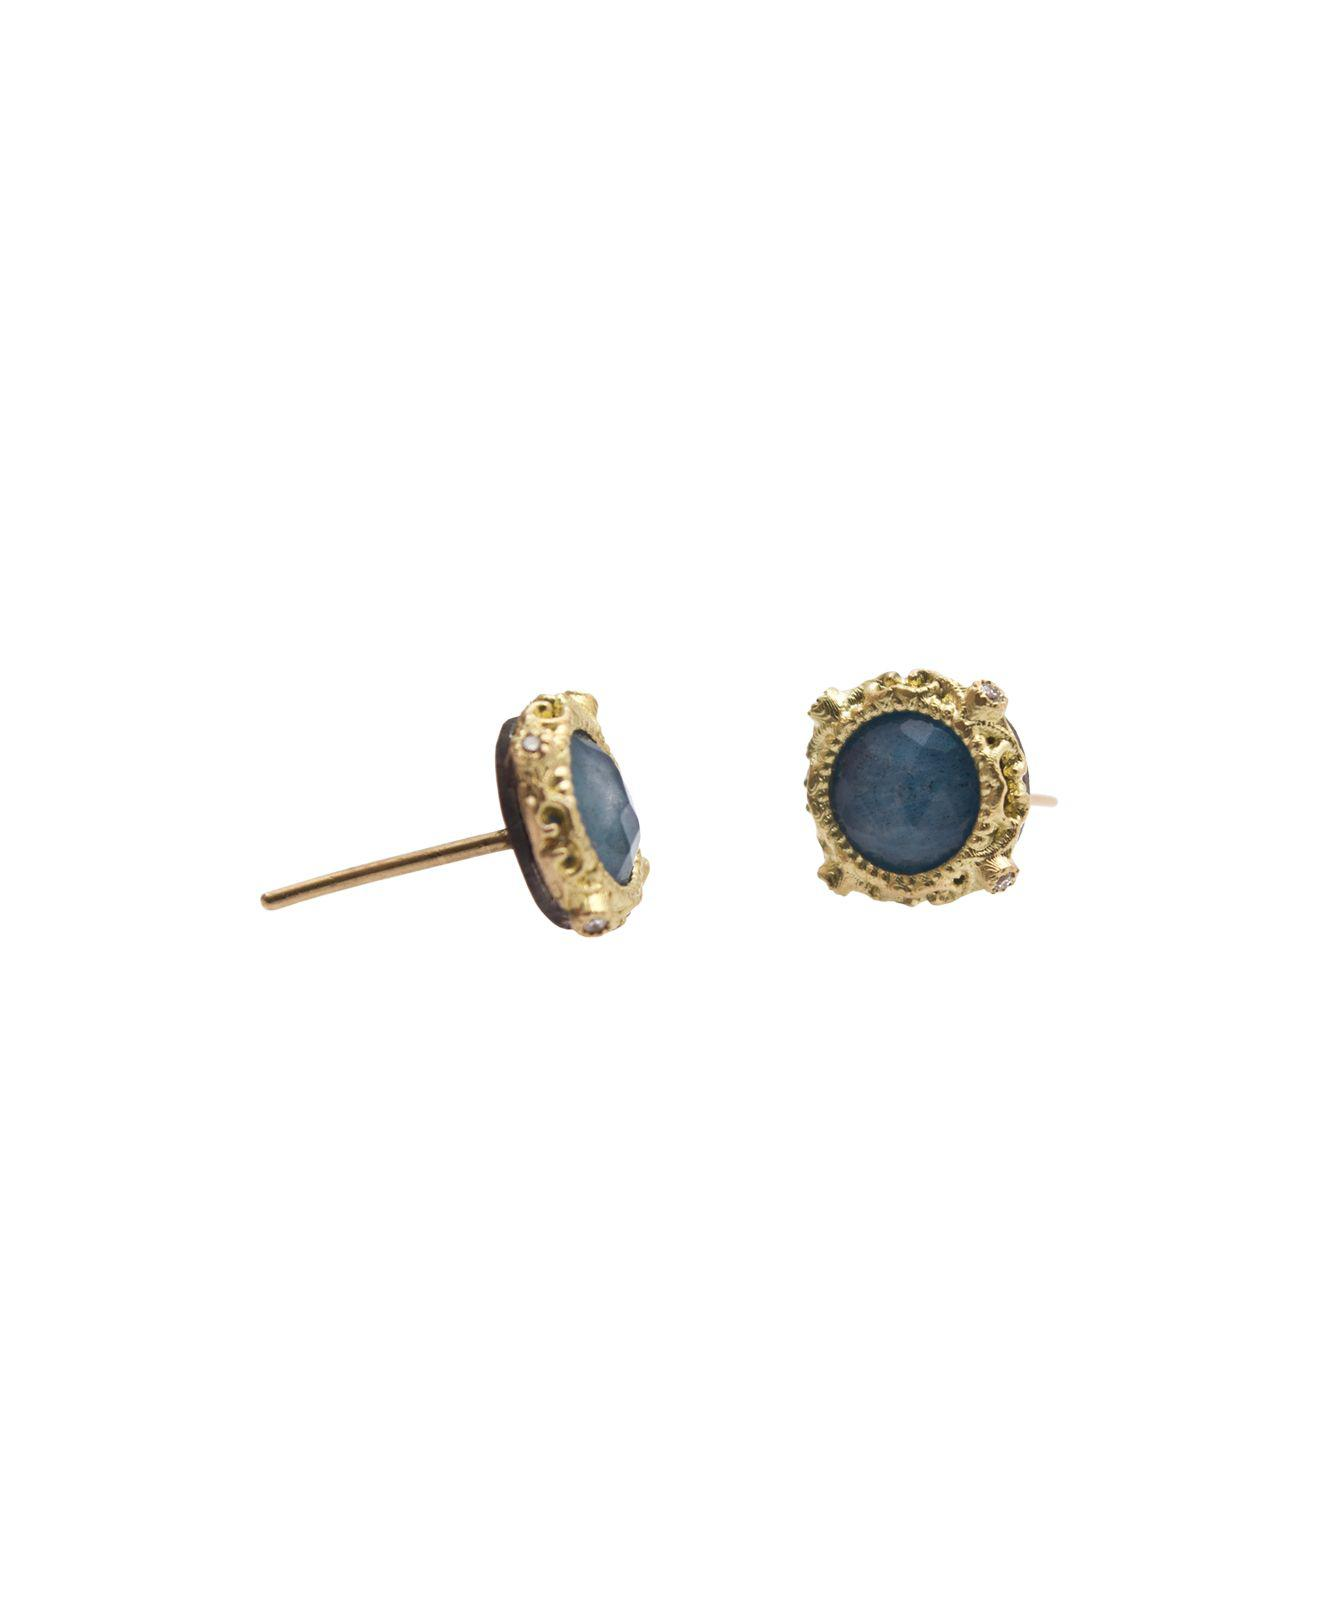 Armenta New World Emerald-Cut Blue Quartz Triplet Earrings with Diamonds 18EKJ2Gl